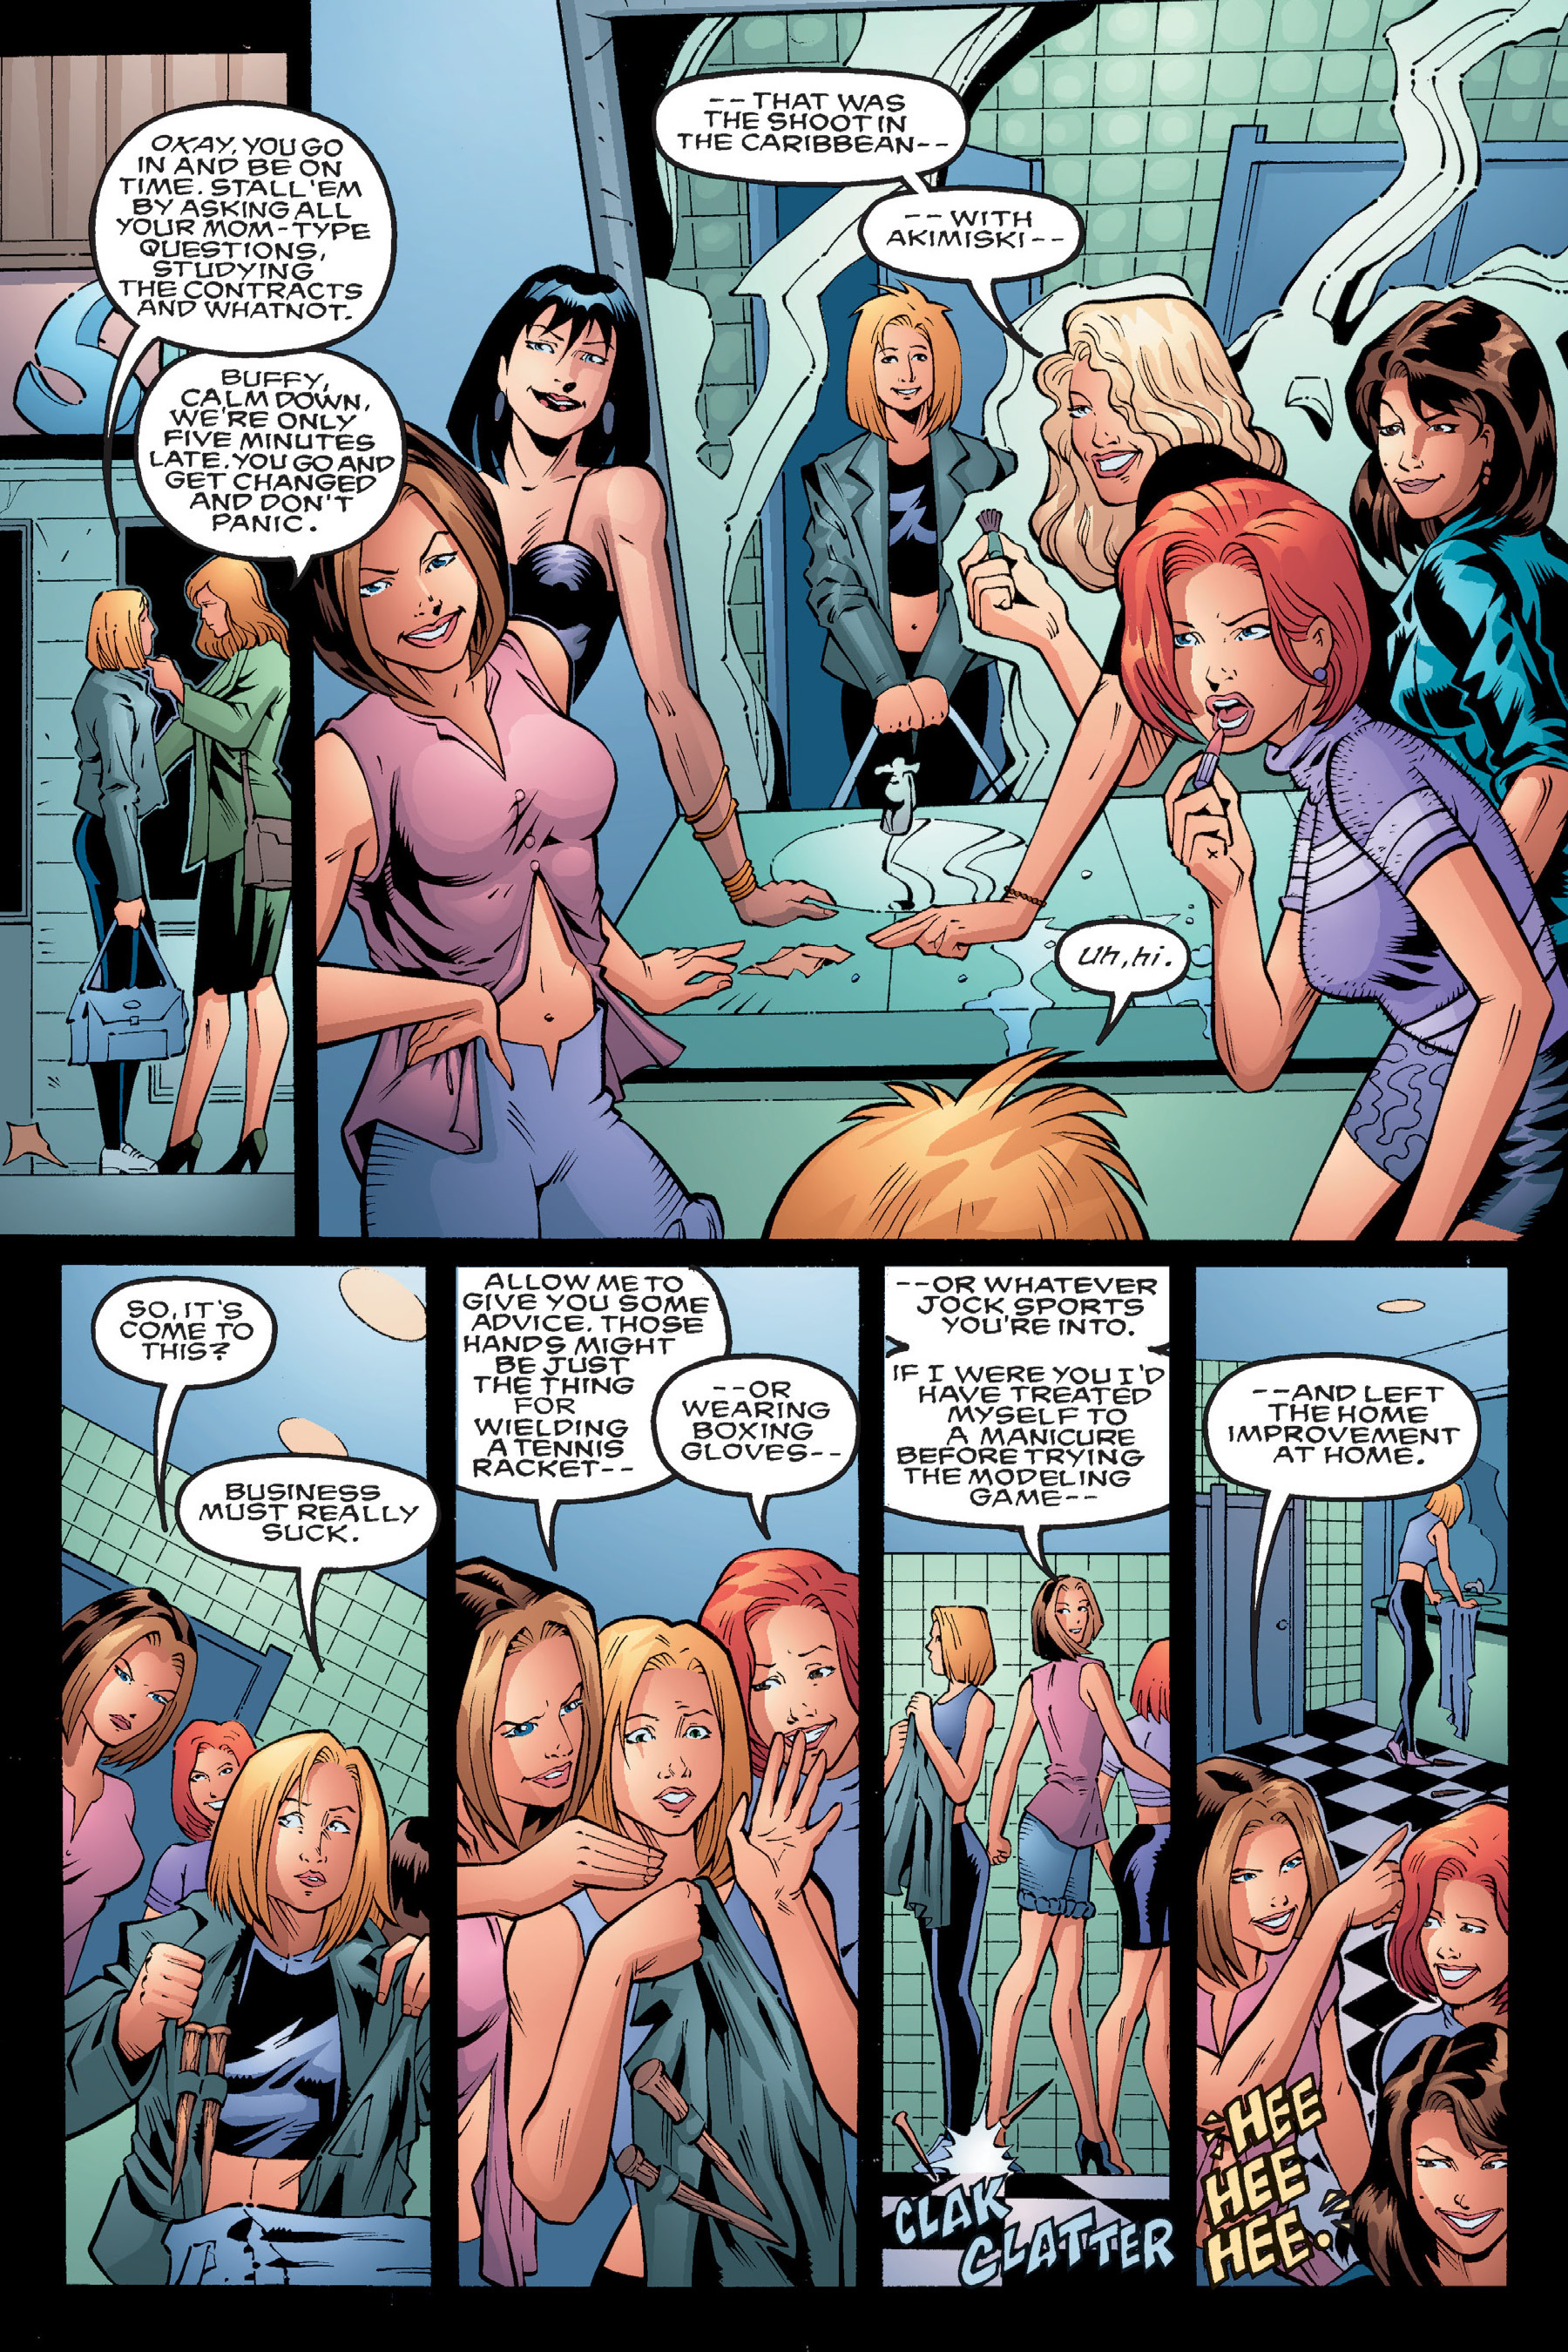 Read online Buffy the Vampire Slayer: Omnibus comic -  Issue # TPB 4 - 37